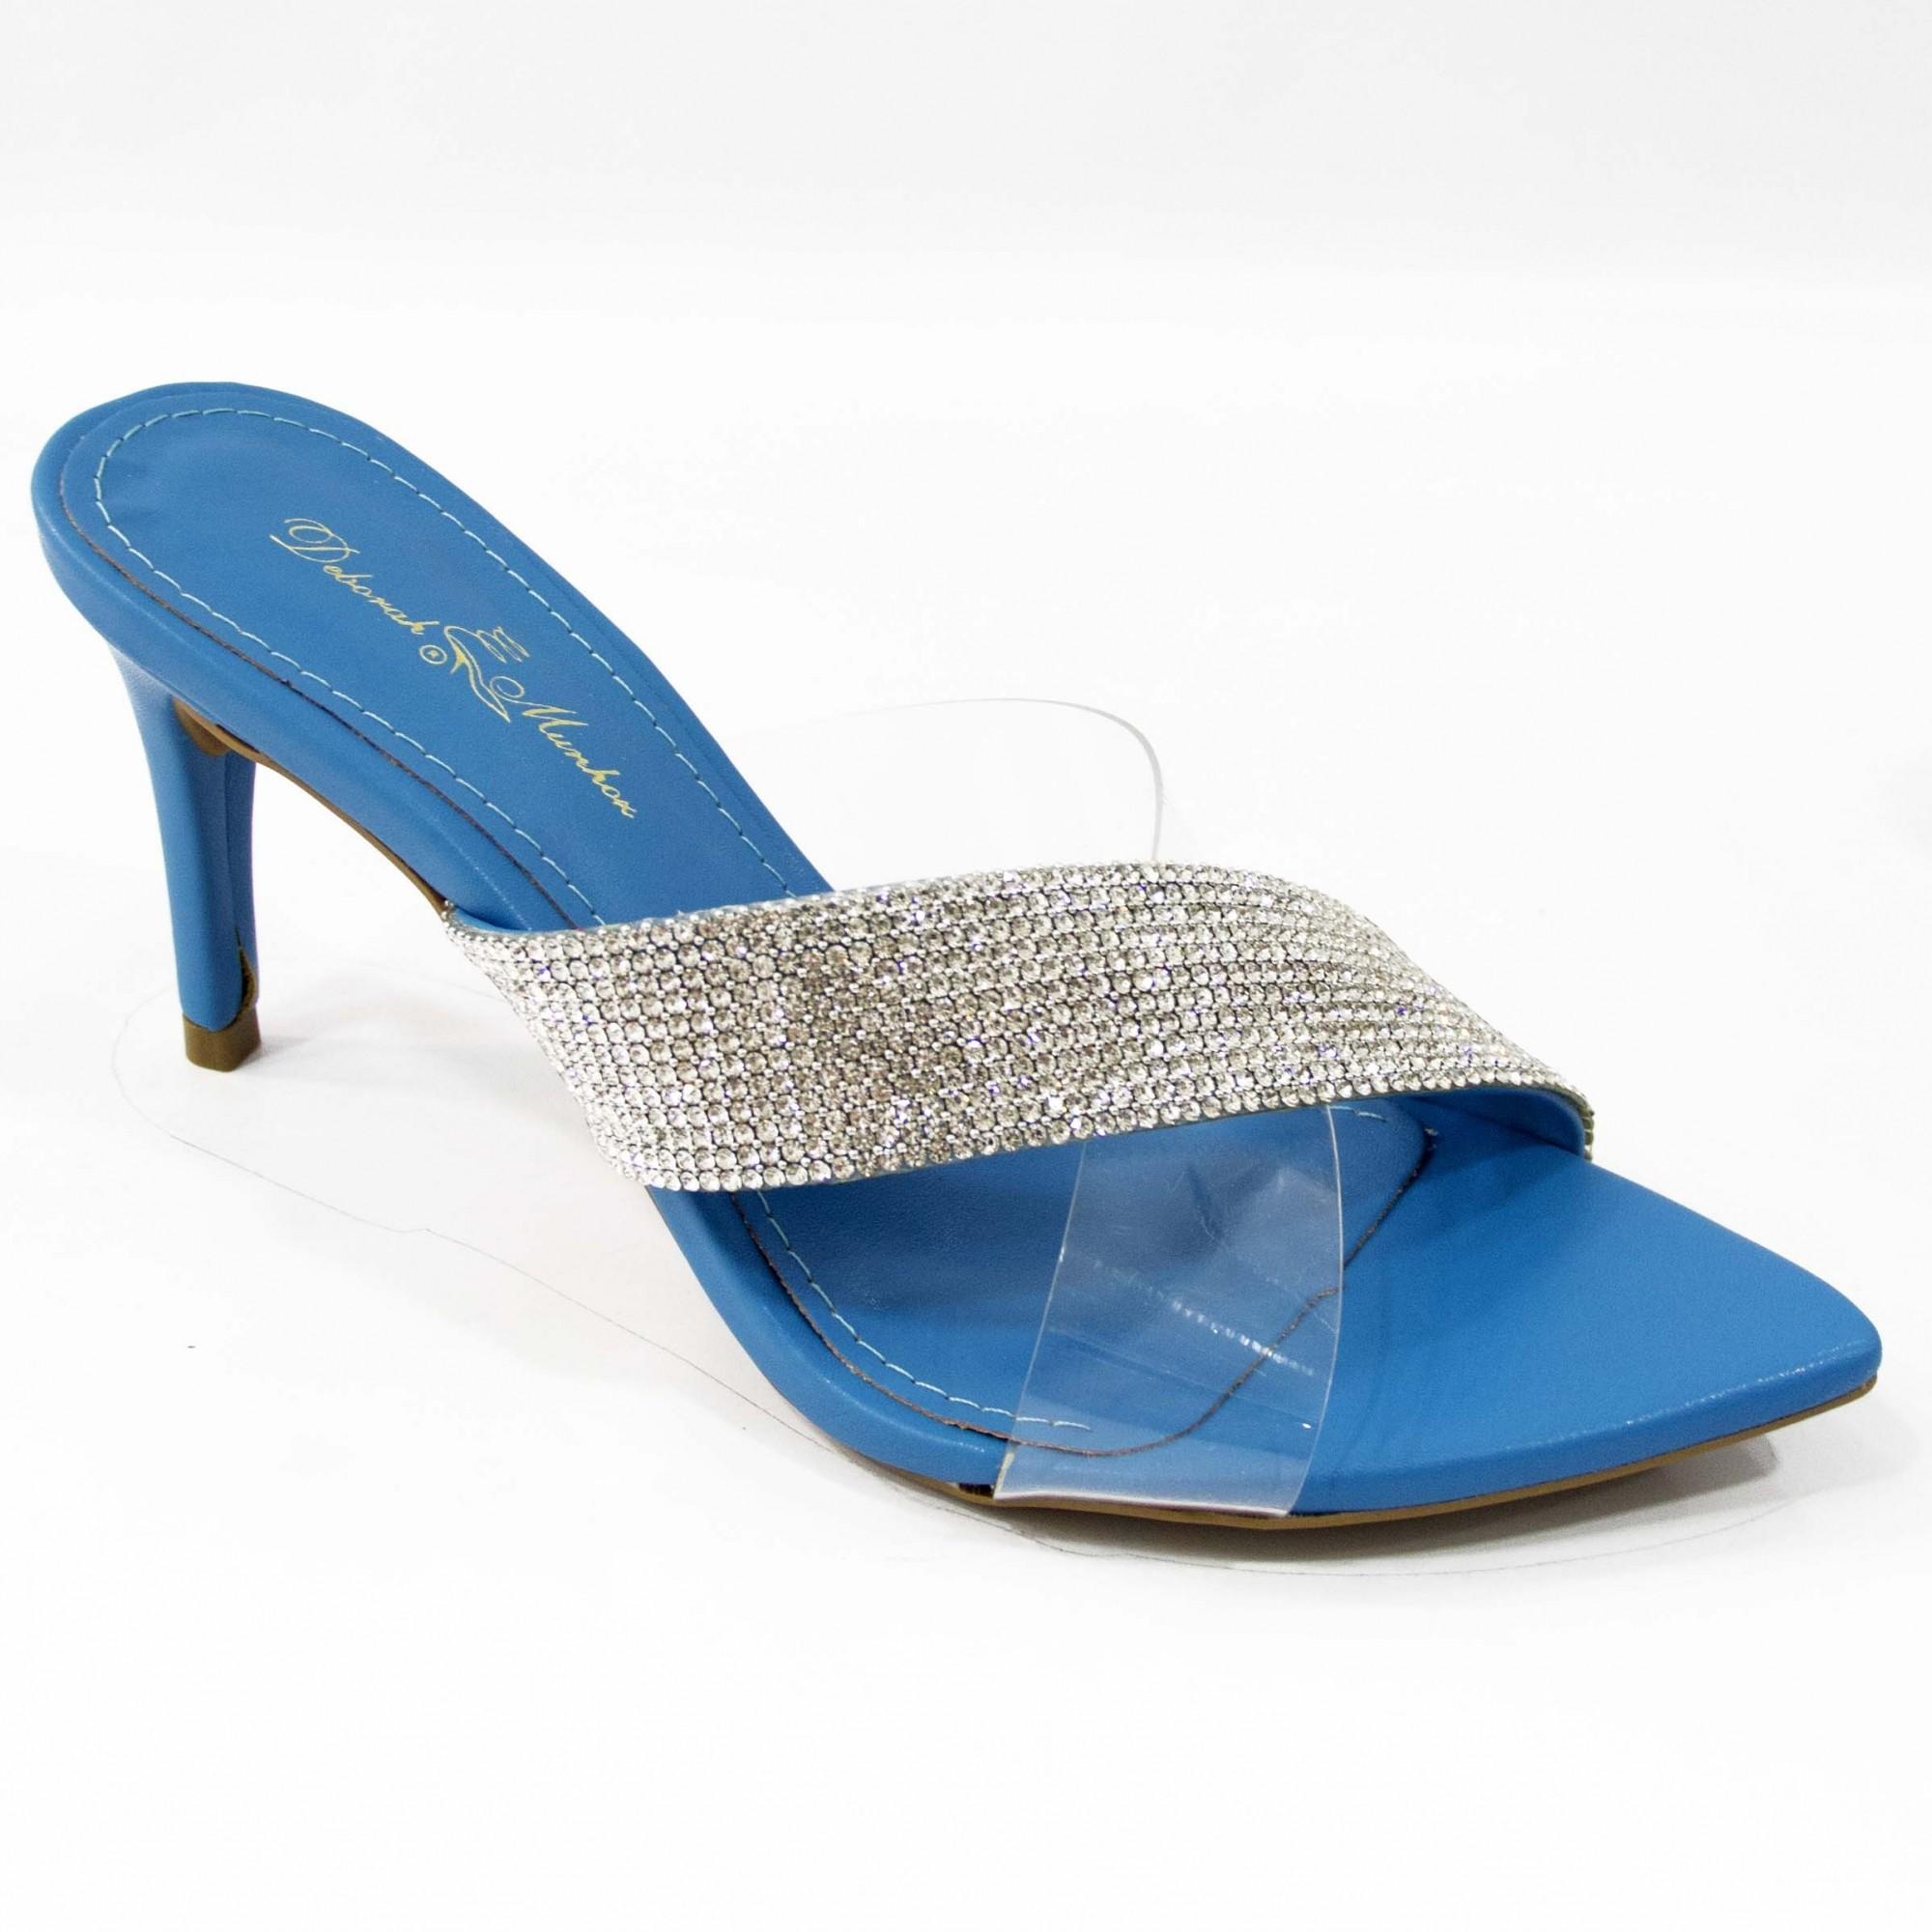 Tamanco Lola Azul by Deborah Munhoz